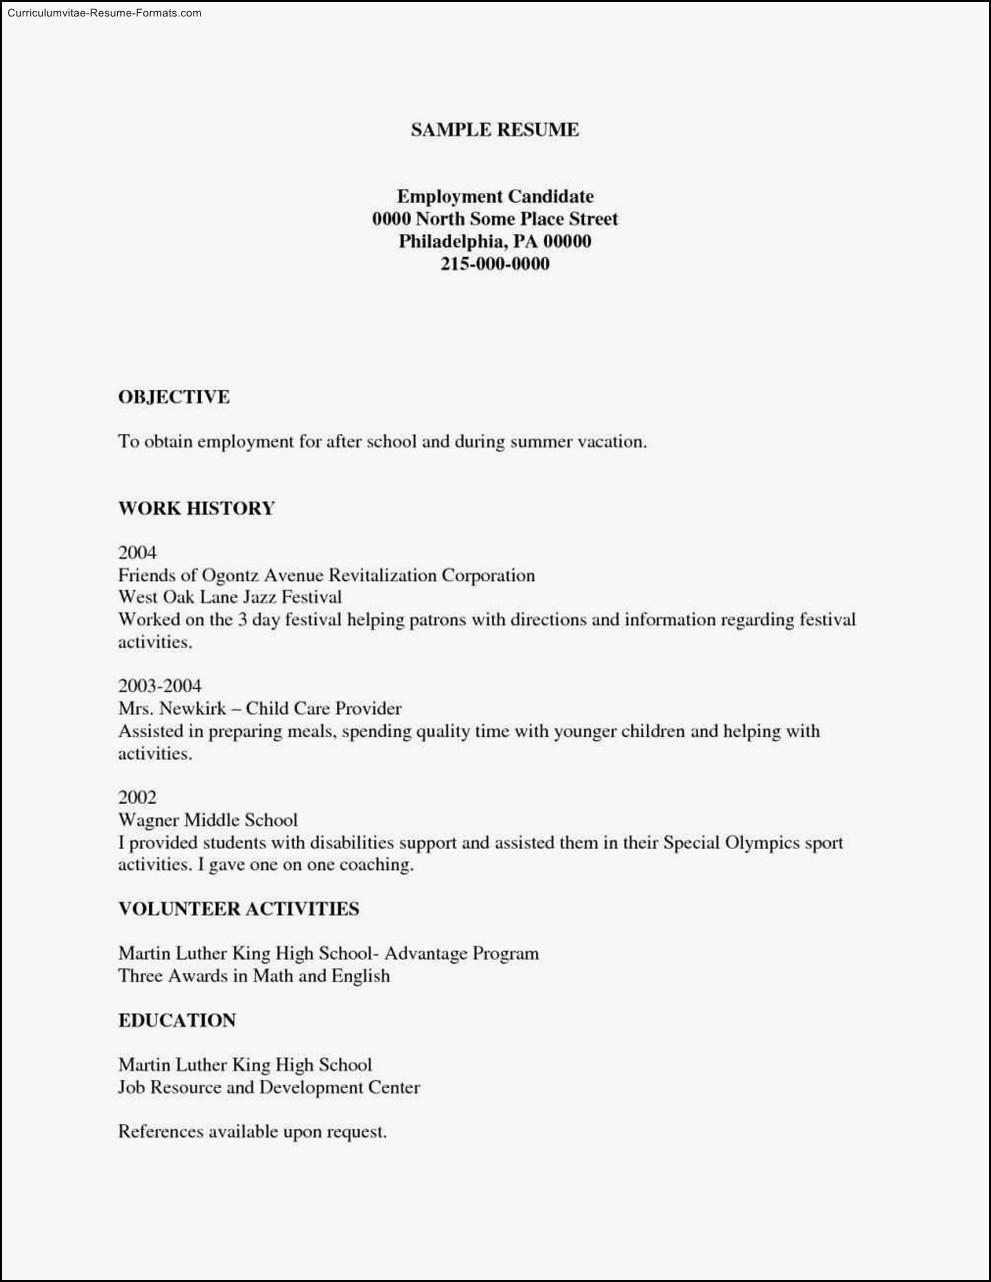 Free Printable Resume Templates     Business Template And Resources - Free Printable Resume Templates